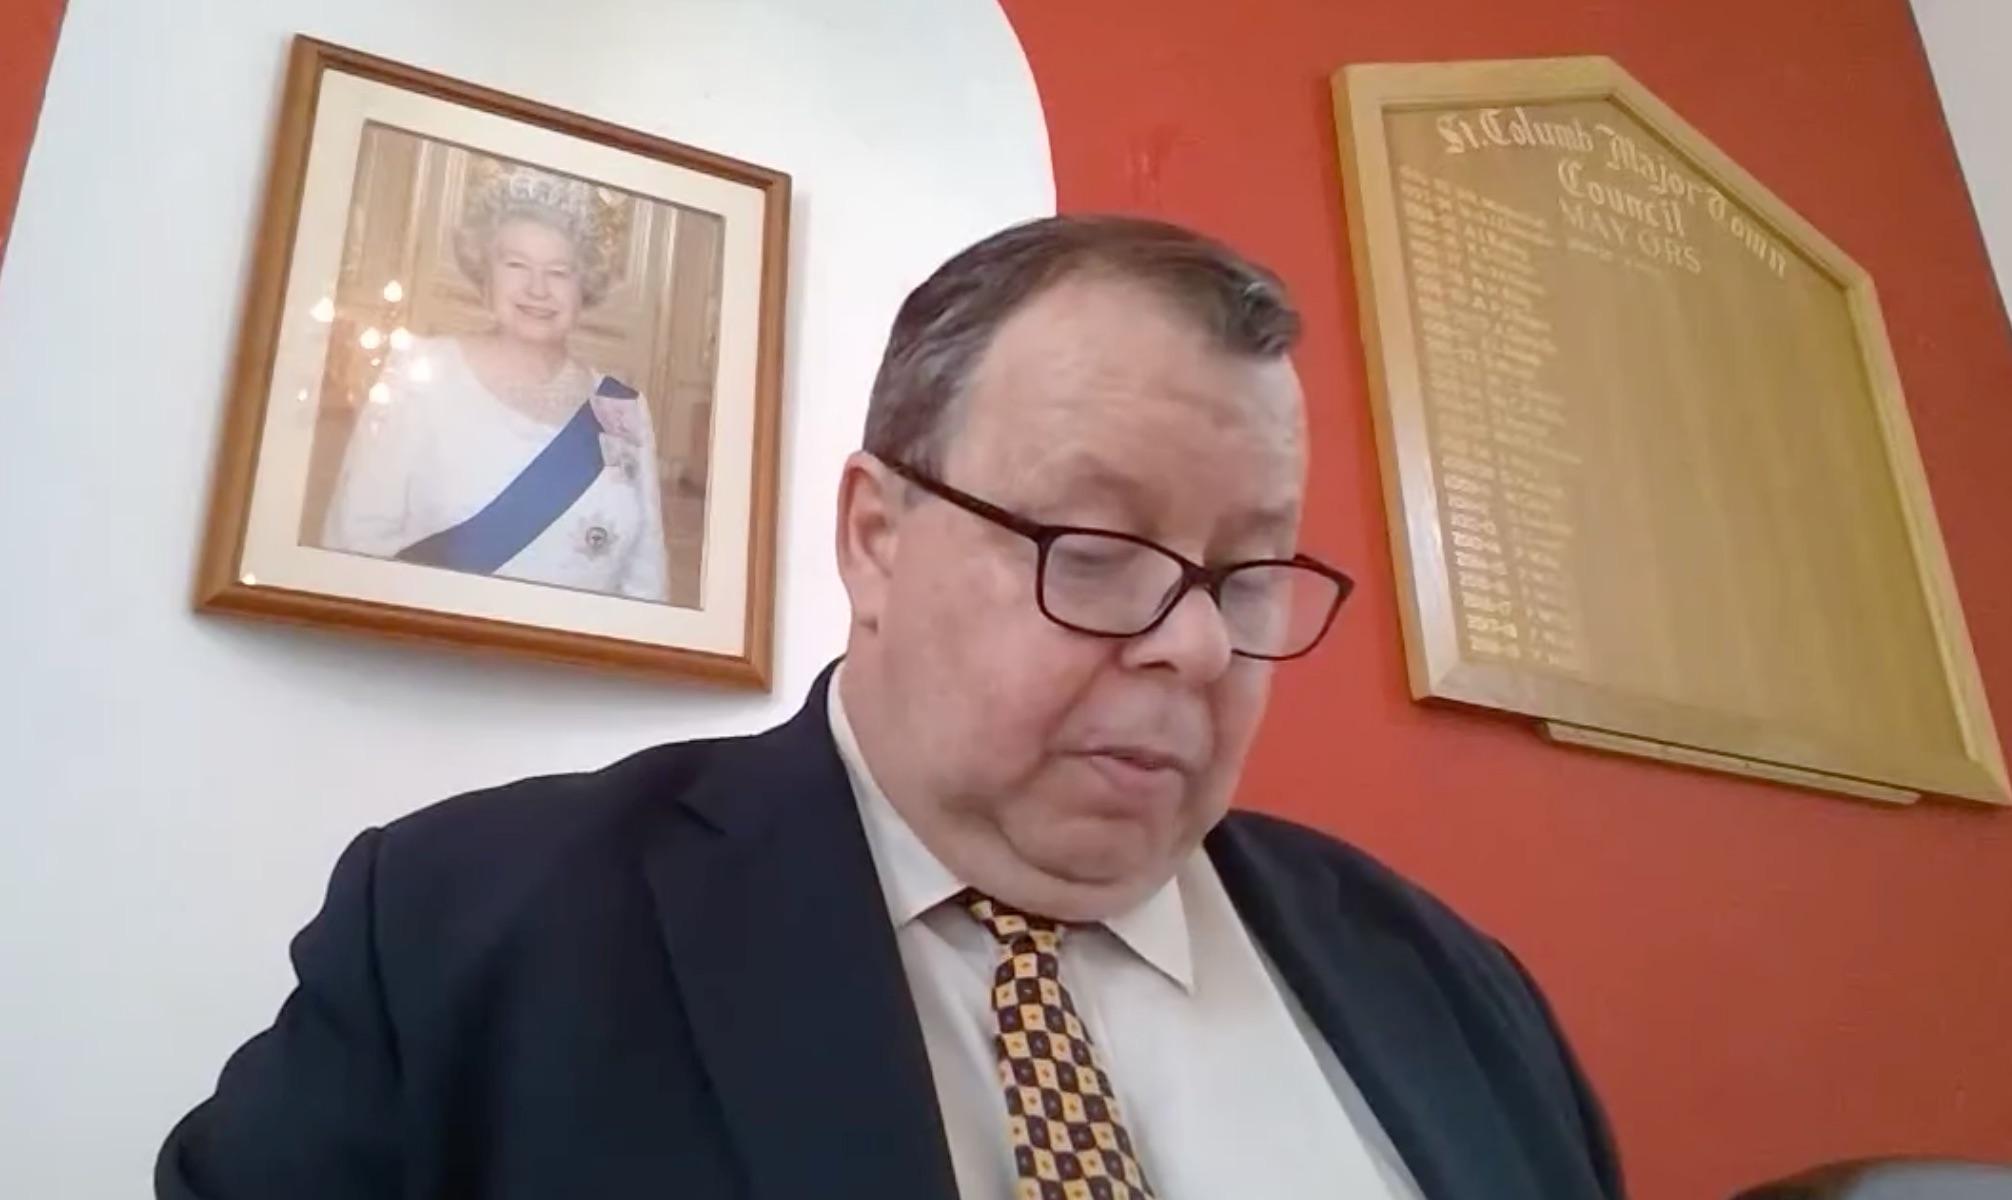 Mayor Paul Wills